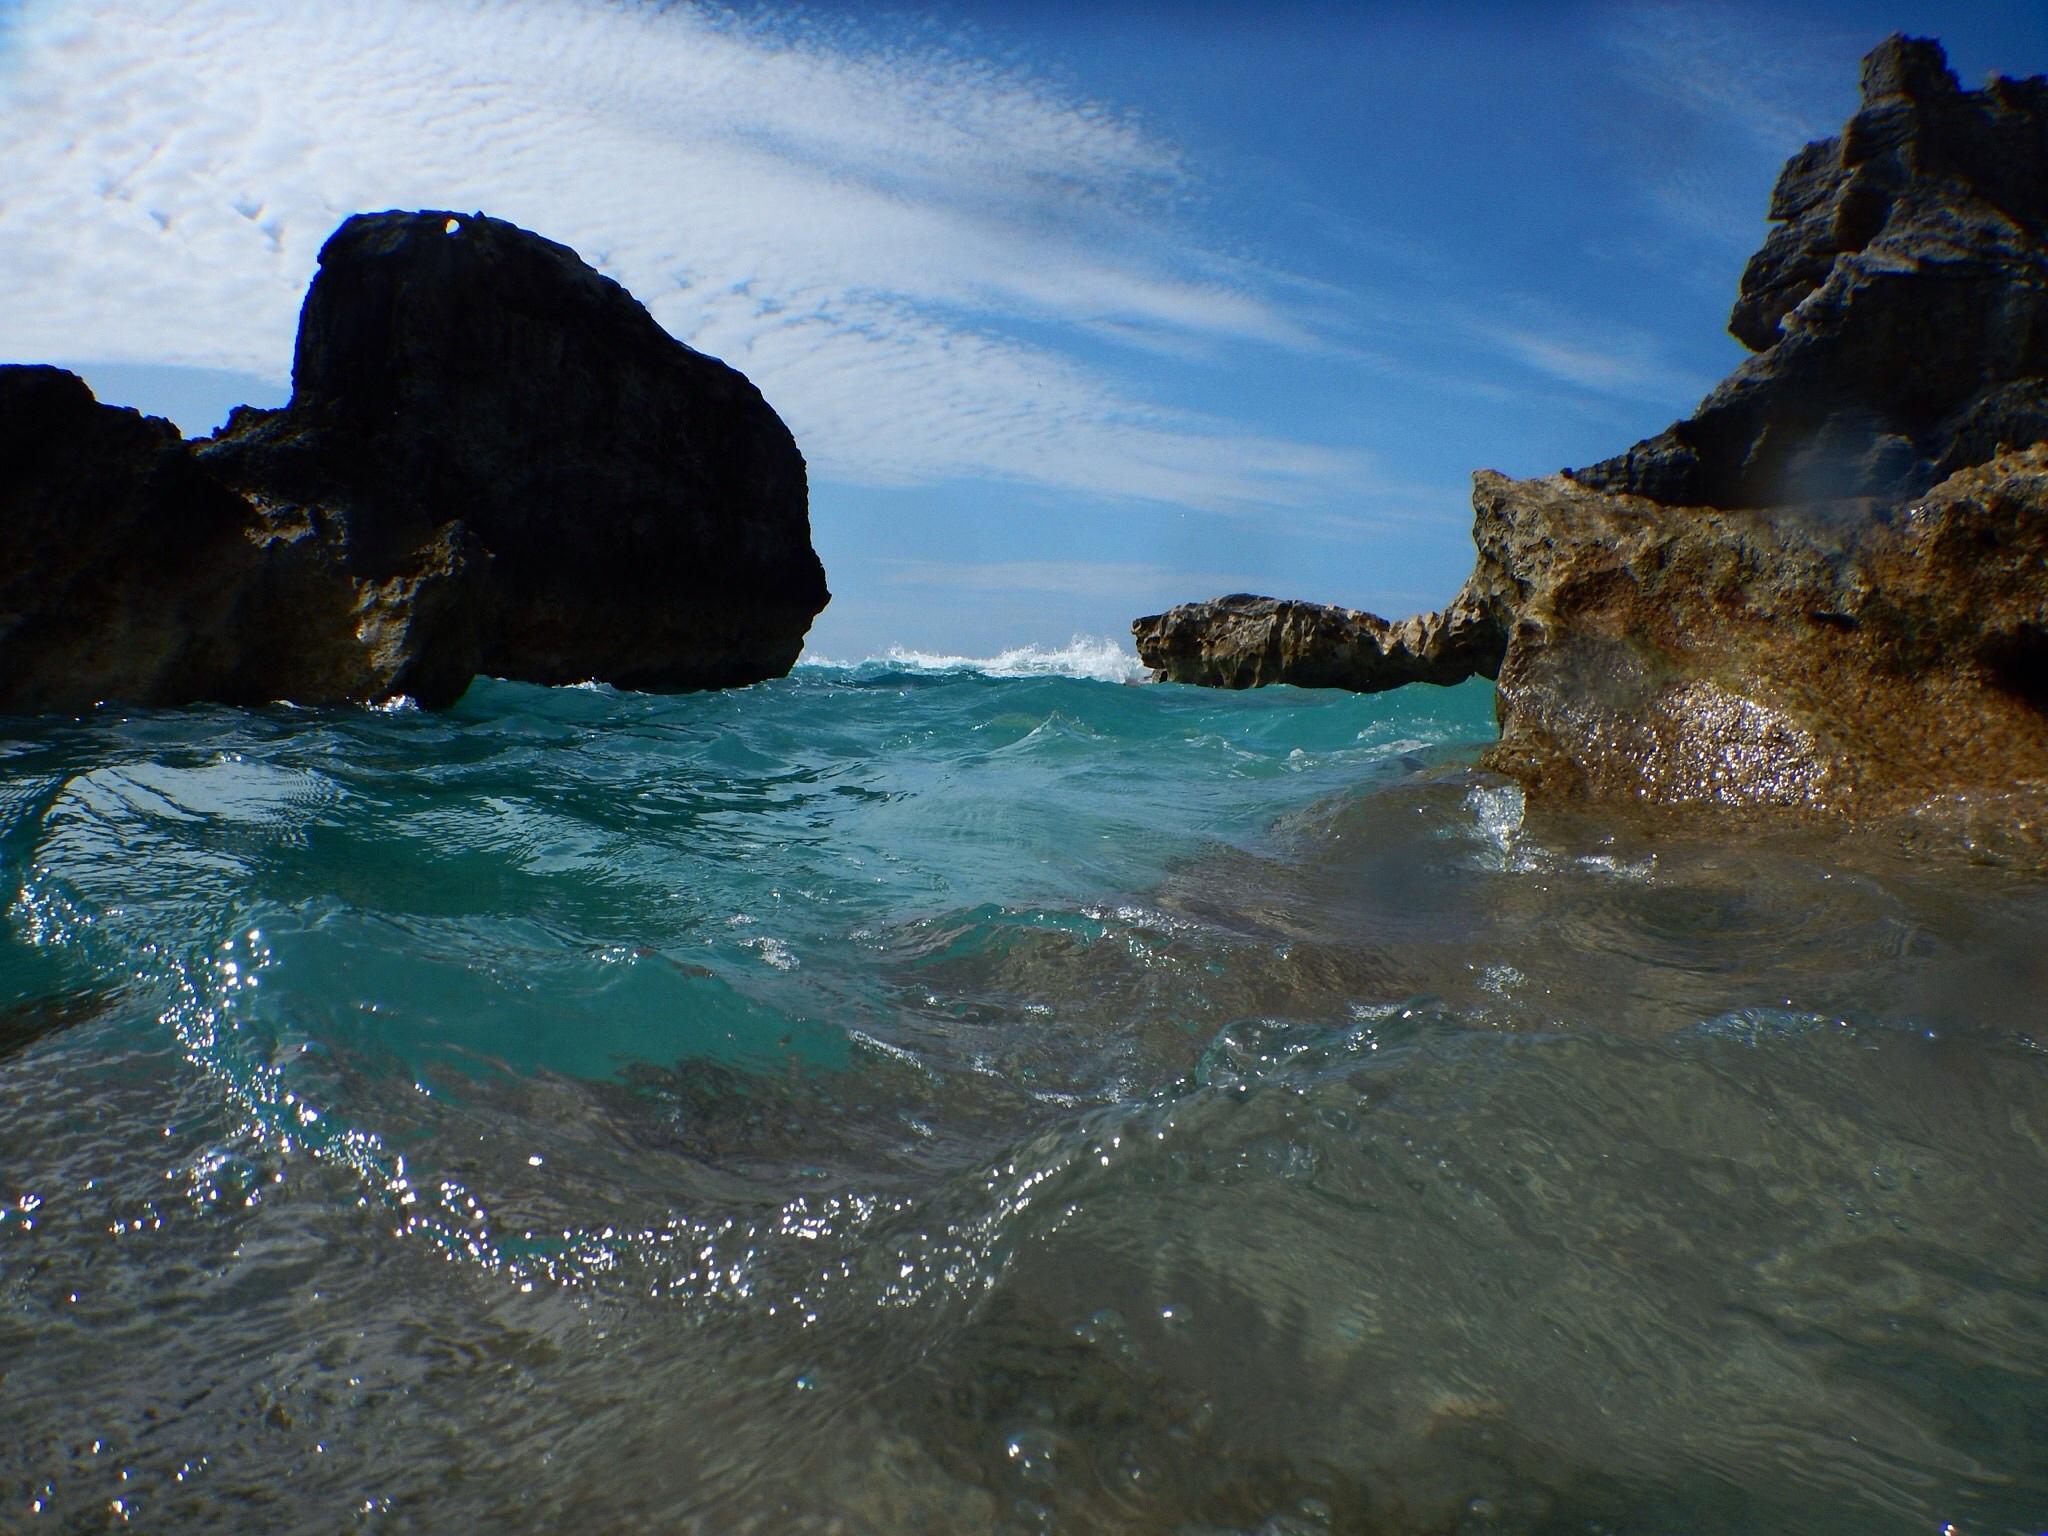 Horseshoe Bay, Bermuda by Ryan W. Niemiec